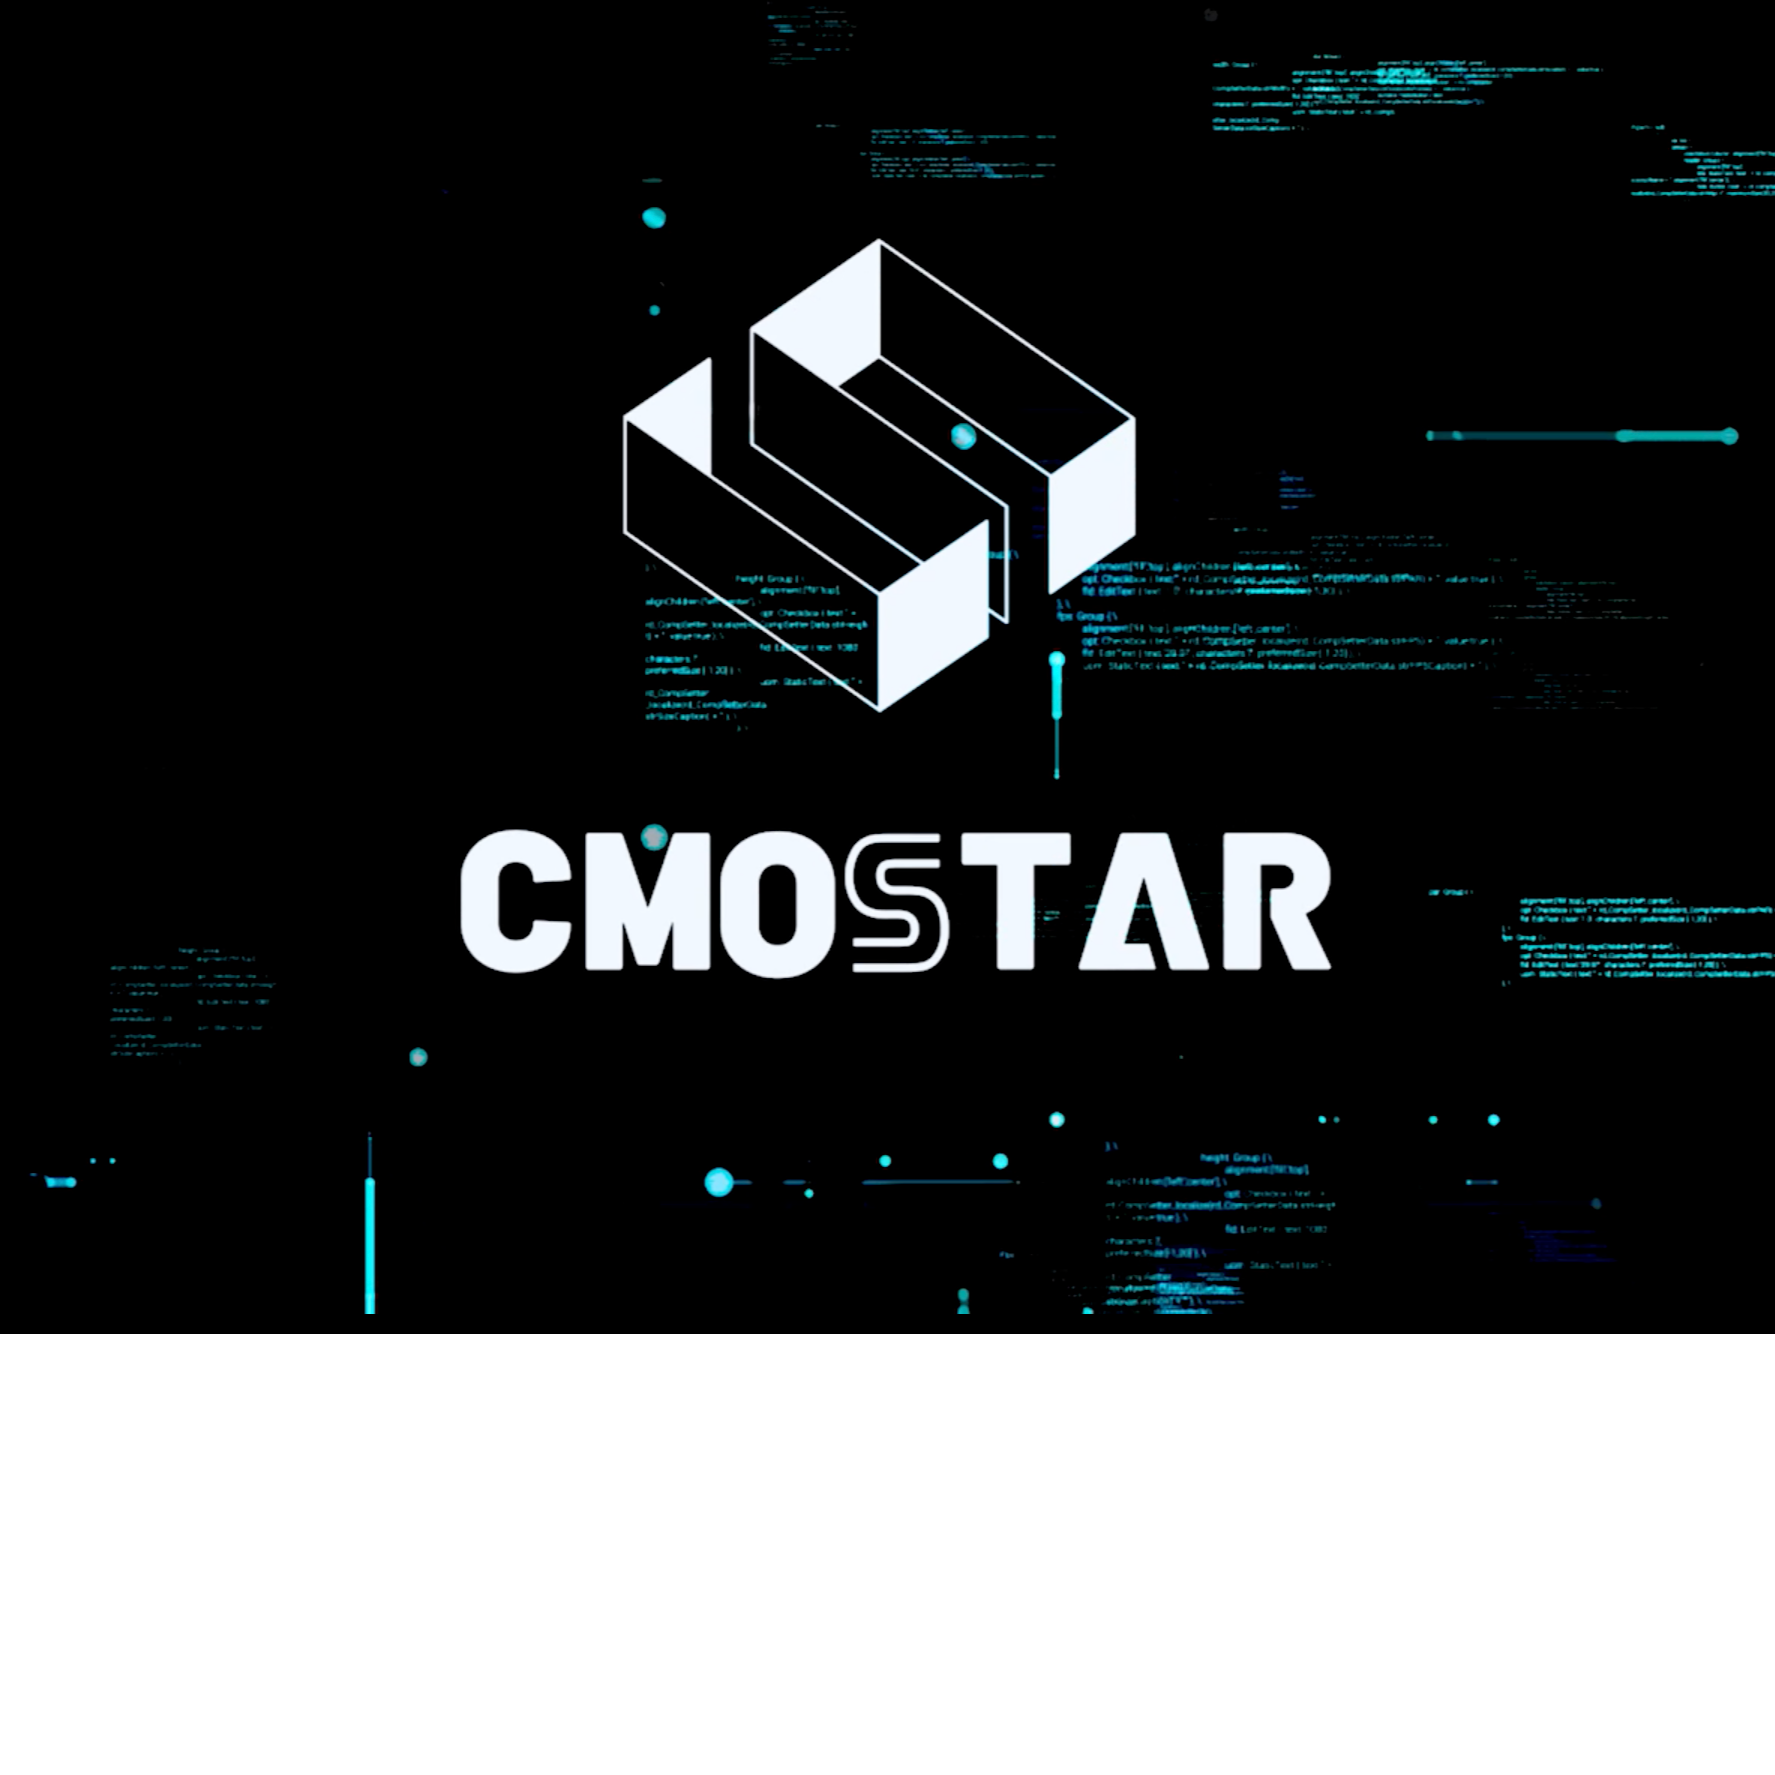 CmoStar